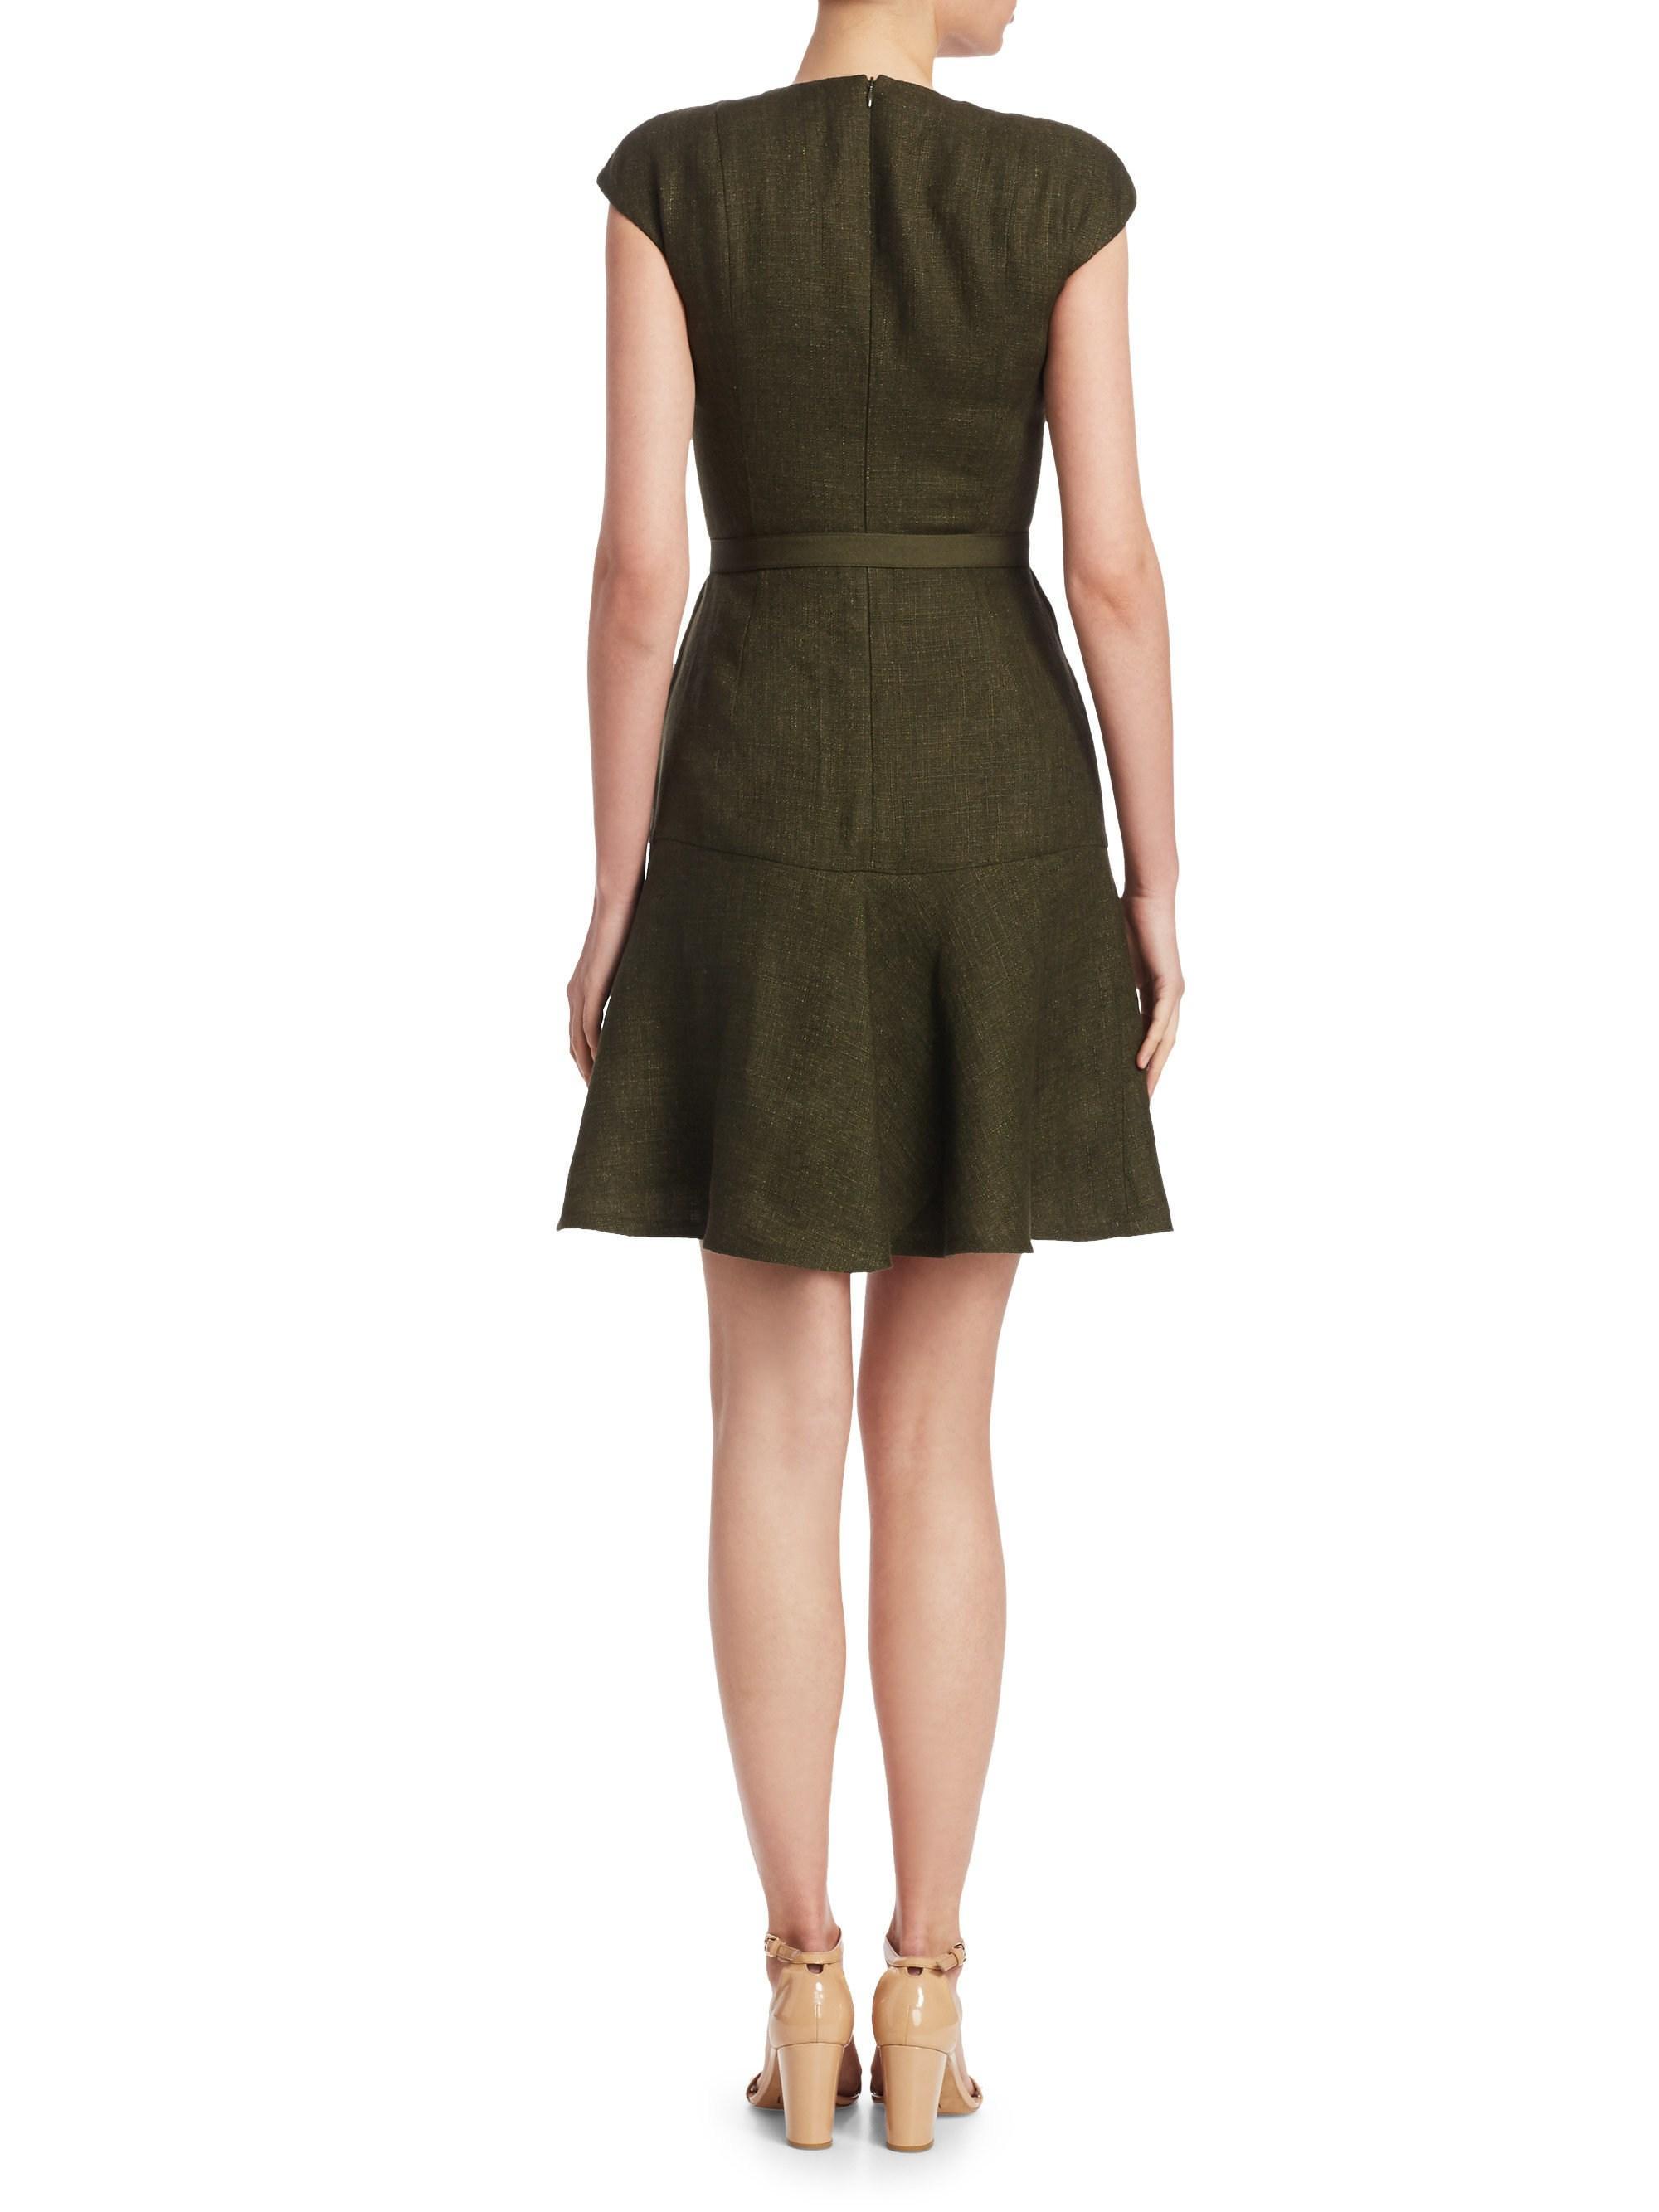 70b6cdc617 Akris Punto Women s Linen Cap-sleeve Dress - Green - Size 12 in ...